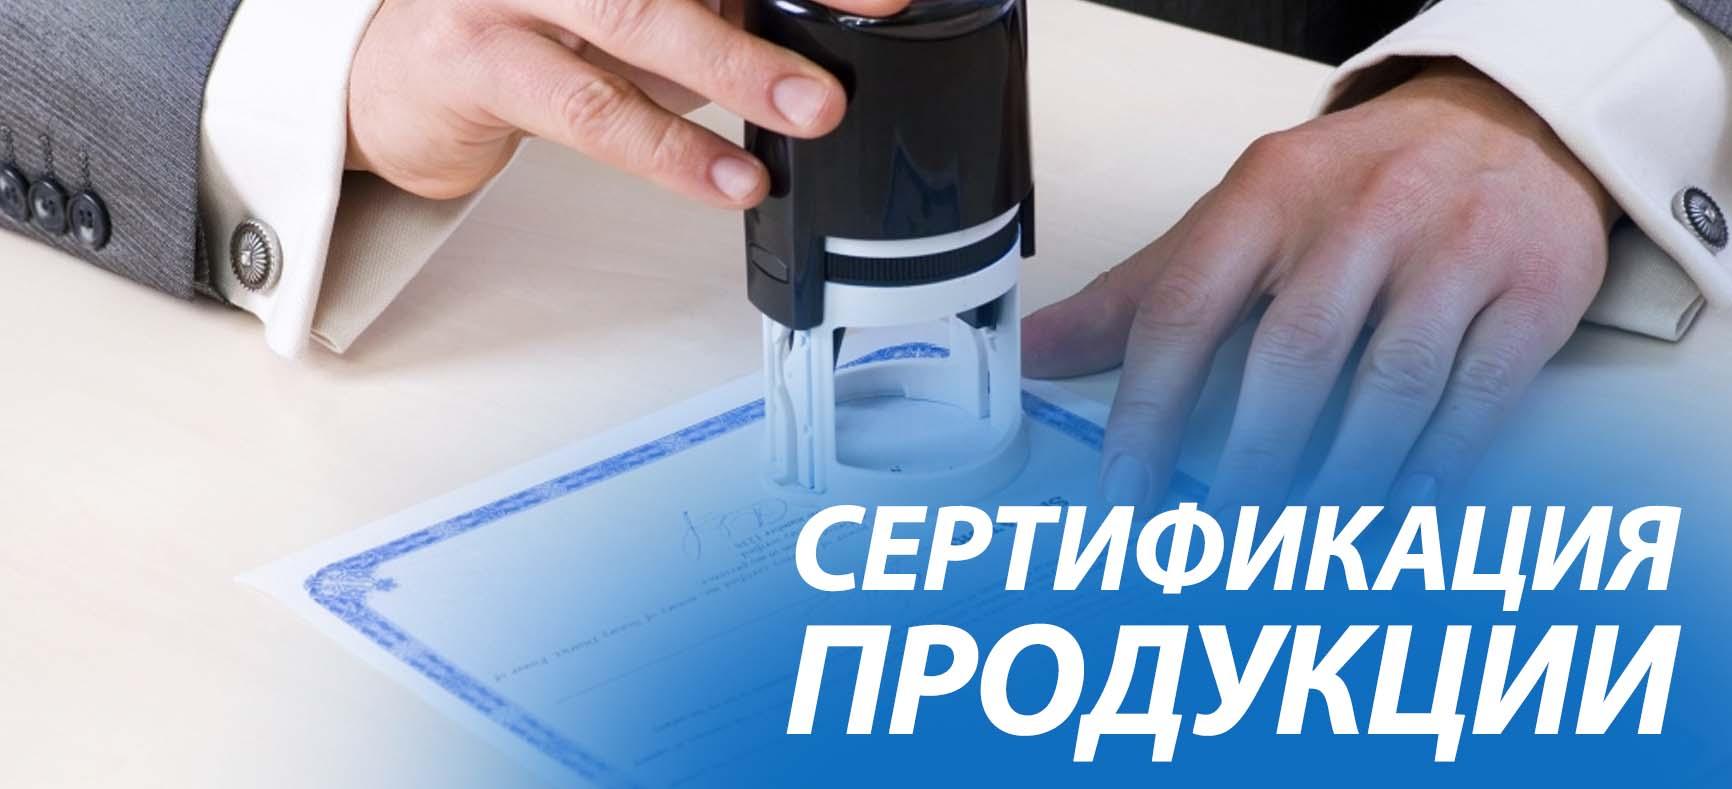 Сертификация продкуции асд-2 сертификация